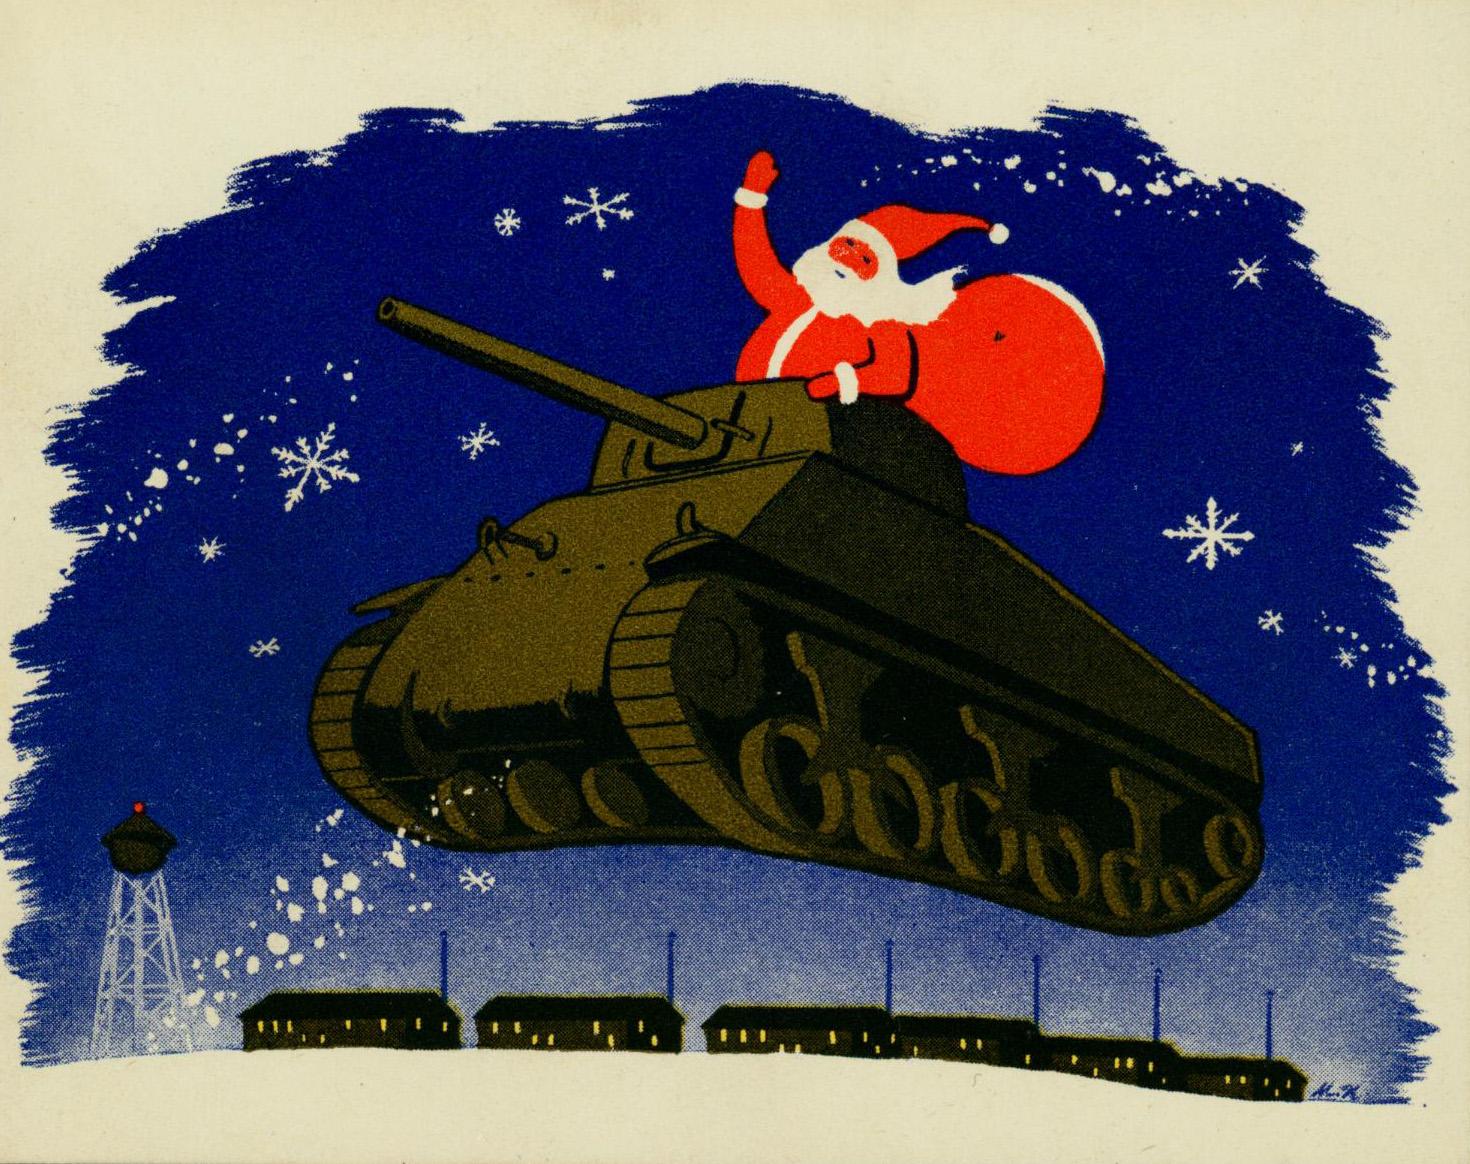 MERRY CHRISTMAS News Warfront Mod For Battlefield 1942